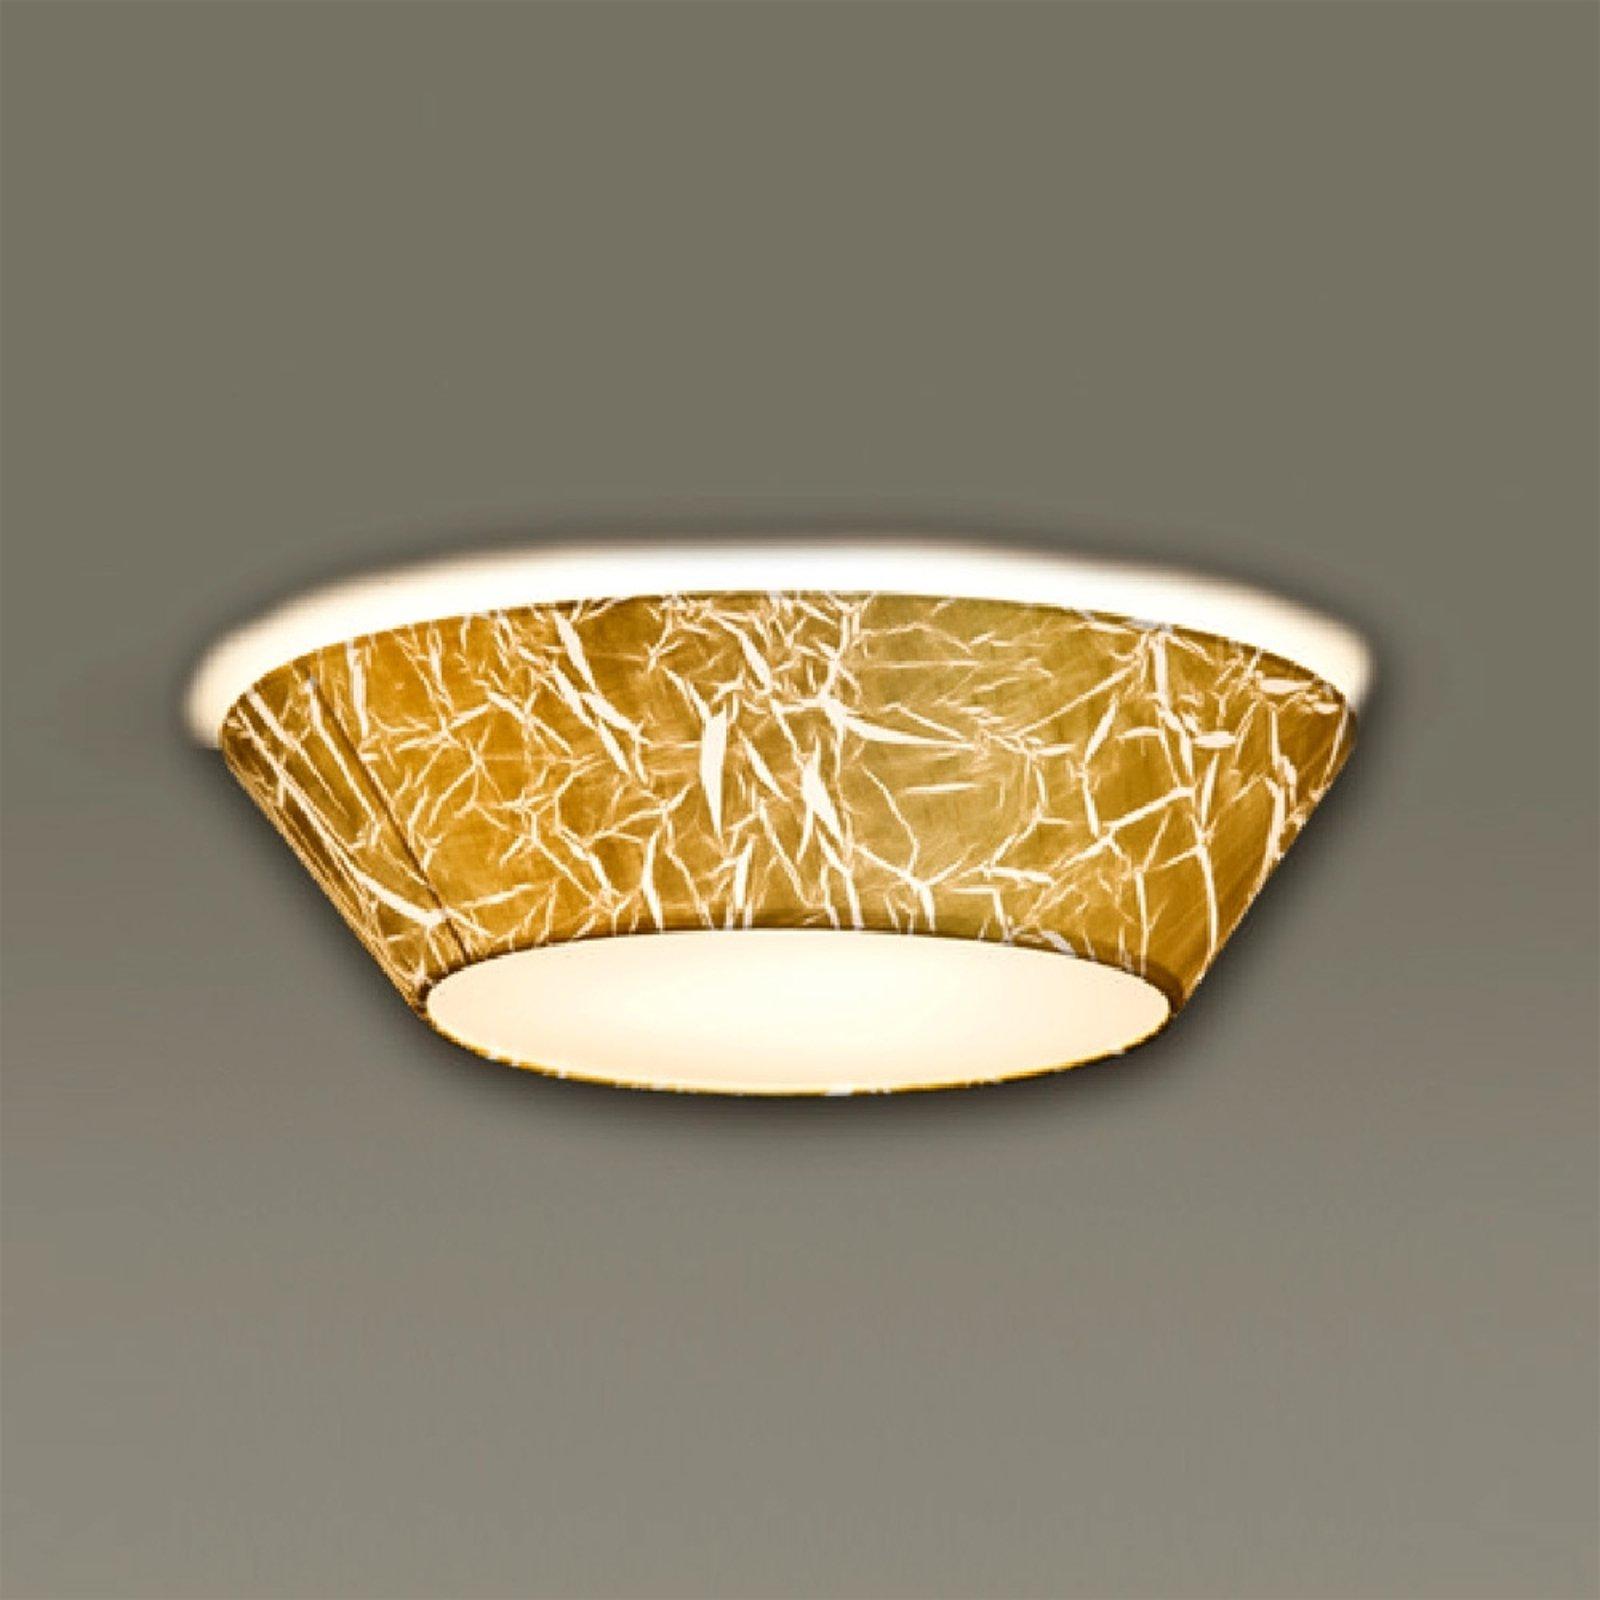 Arius - taklampe med strapattofolie 45 cm